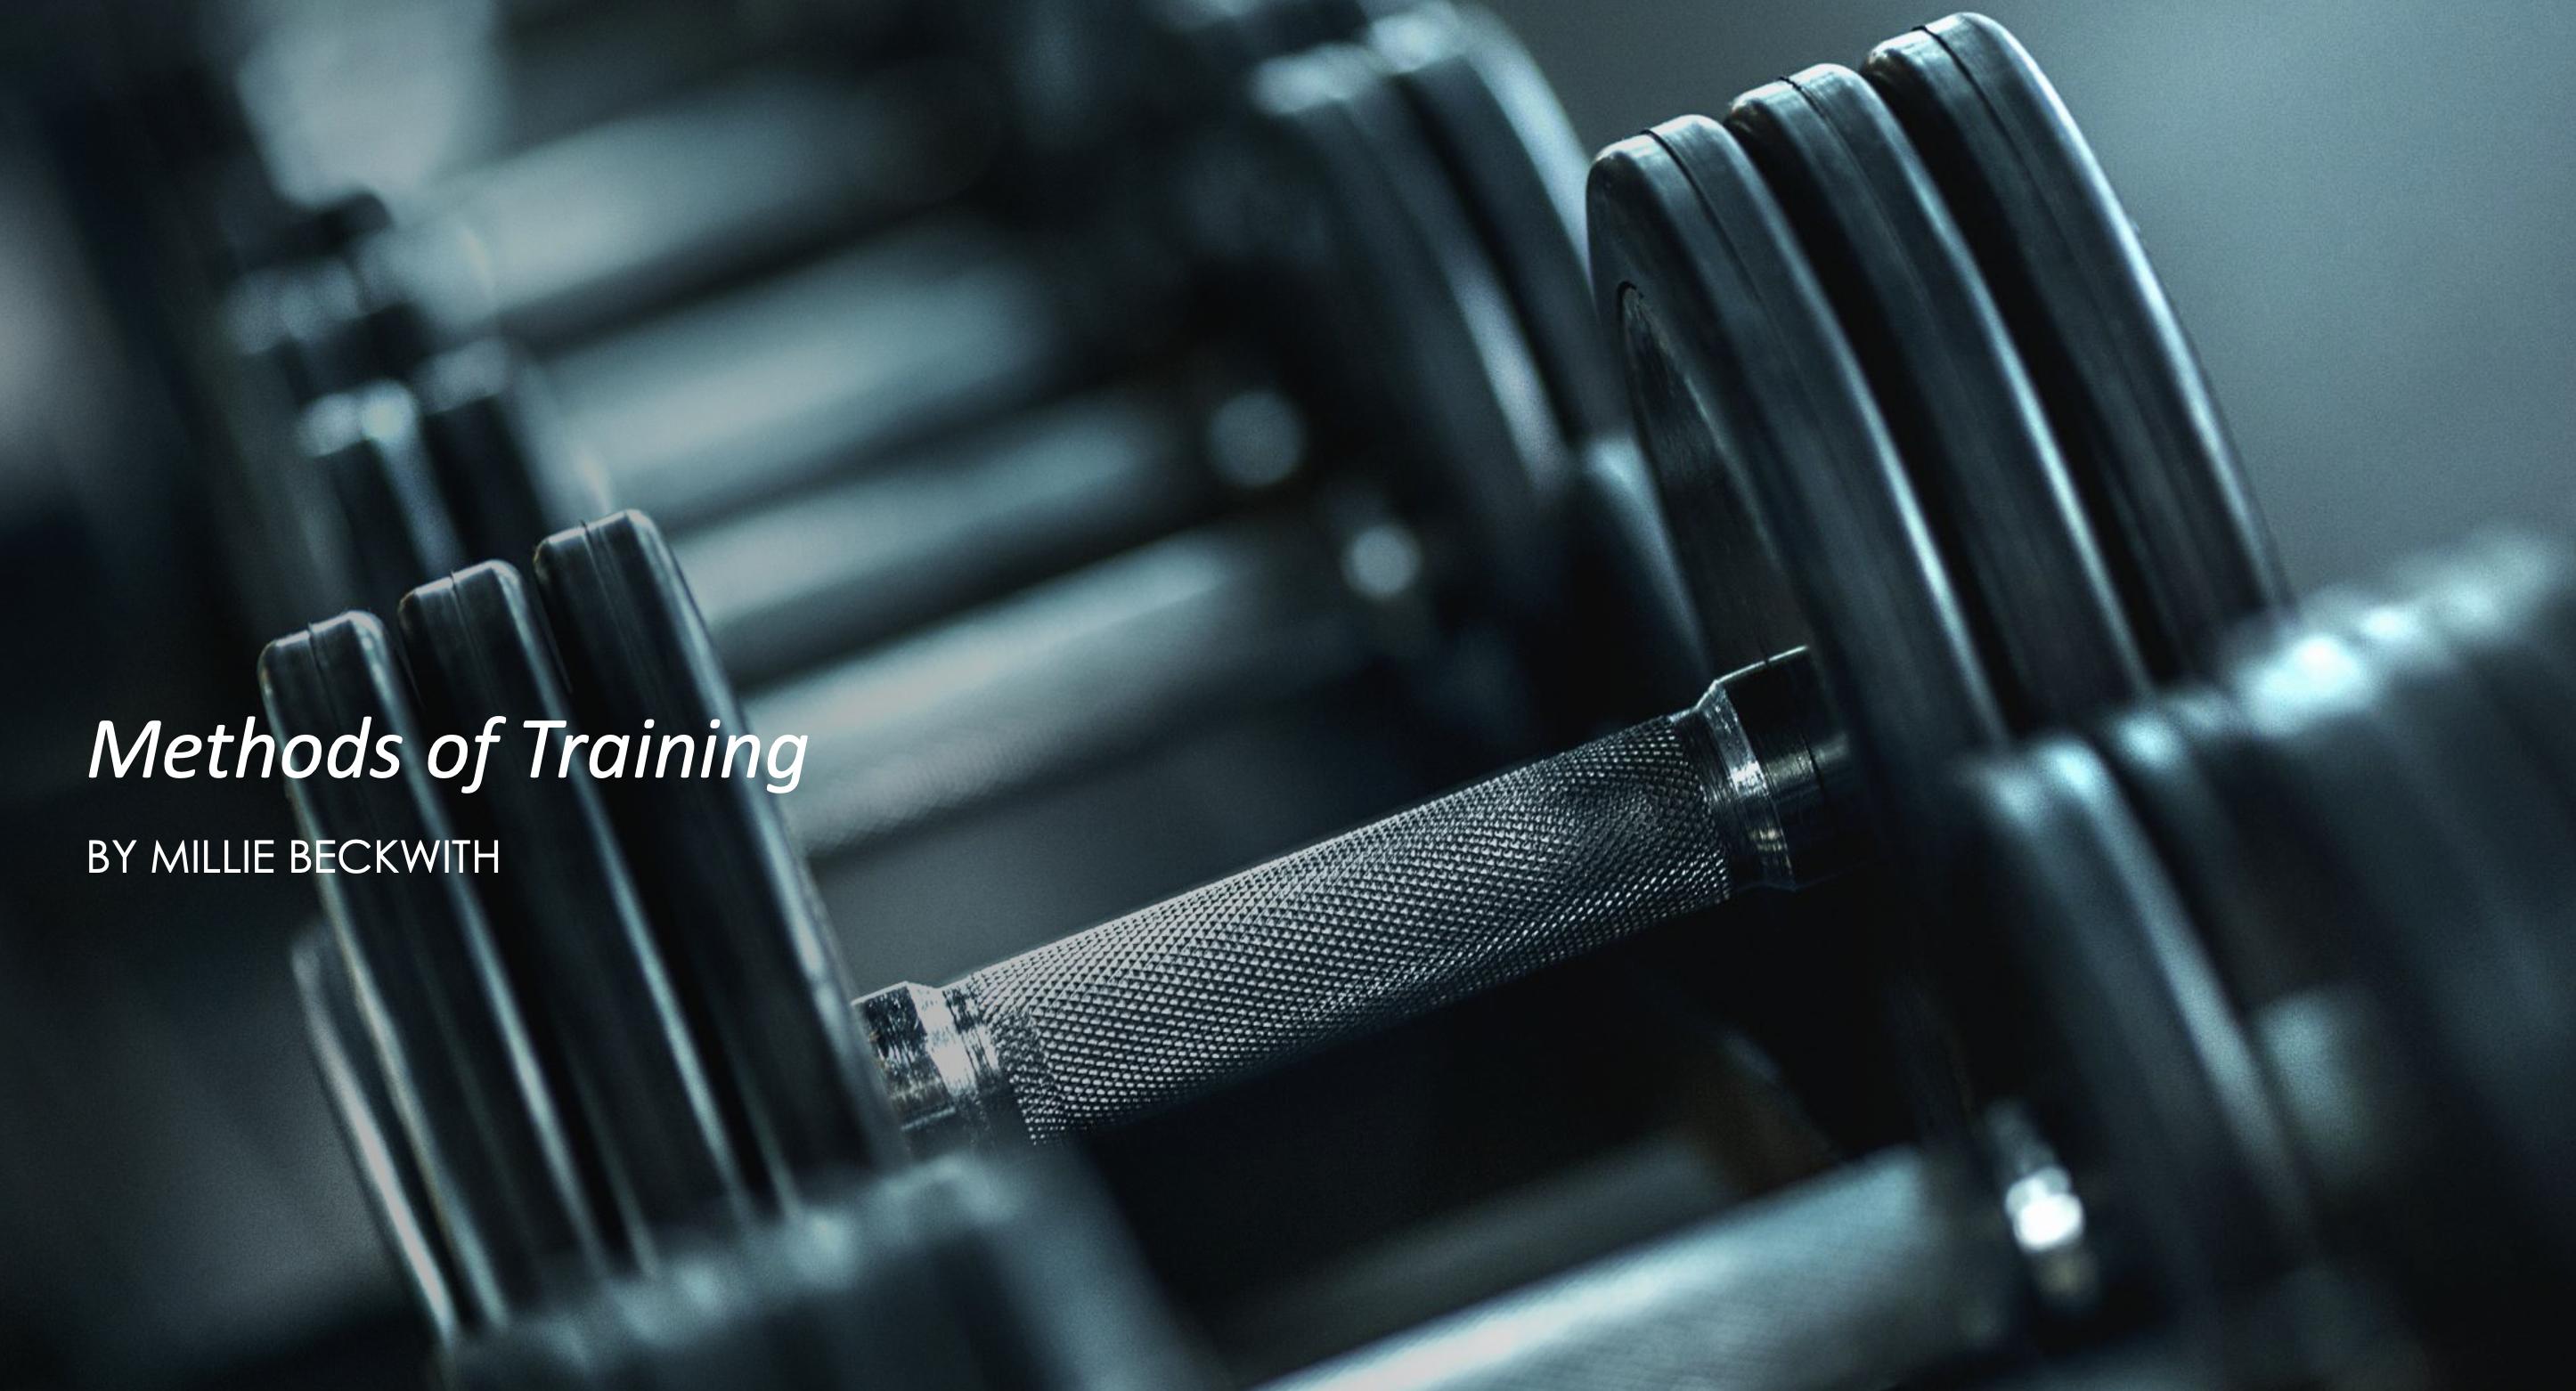 14/05/20 - Methods of Training